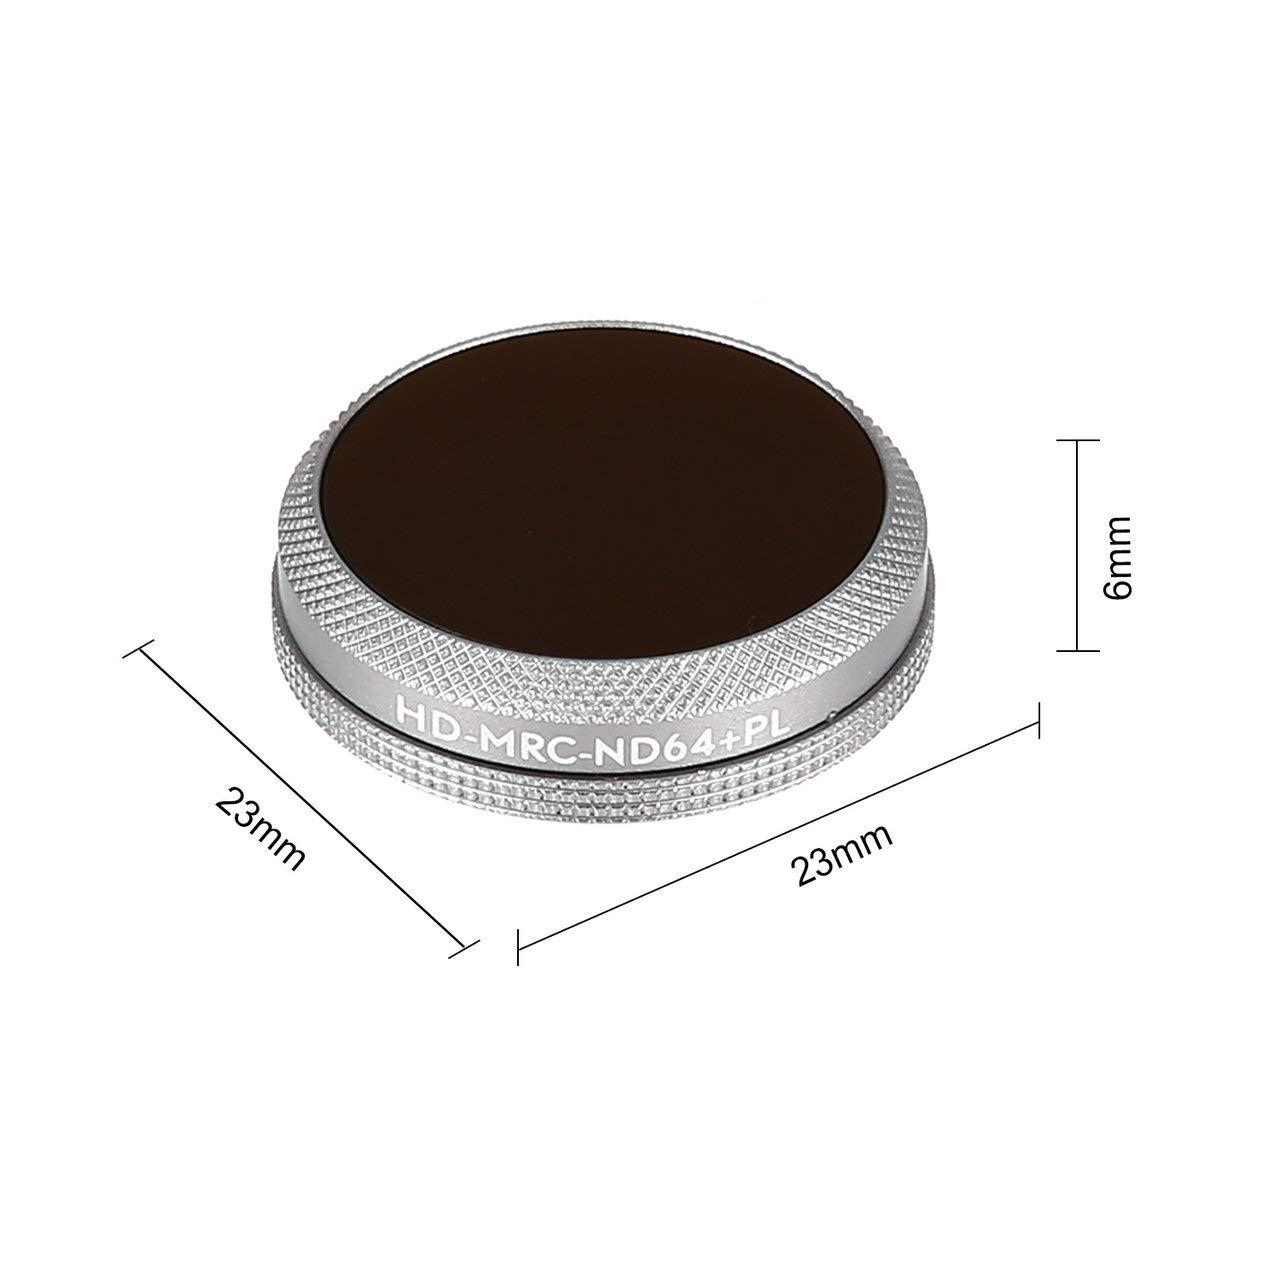 Jasnyfall Cranberry HD-MRC-UV/CPL / ND8 / 16/32 Objektivfilter Objektivfilter Objektivfilter für DJI Mavic 2 Zoom Kamera Grau HD-MRC-UV/CPL / ND8 / 16/32 74f42b